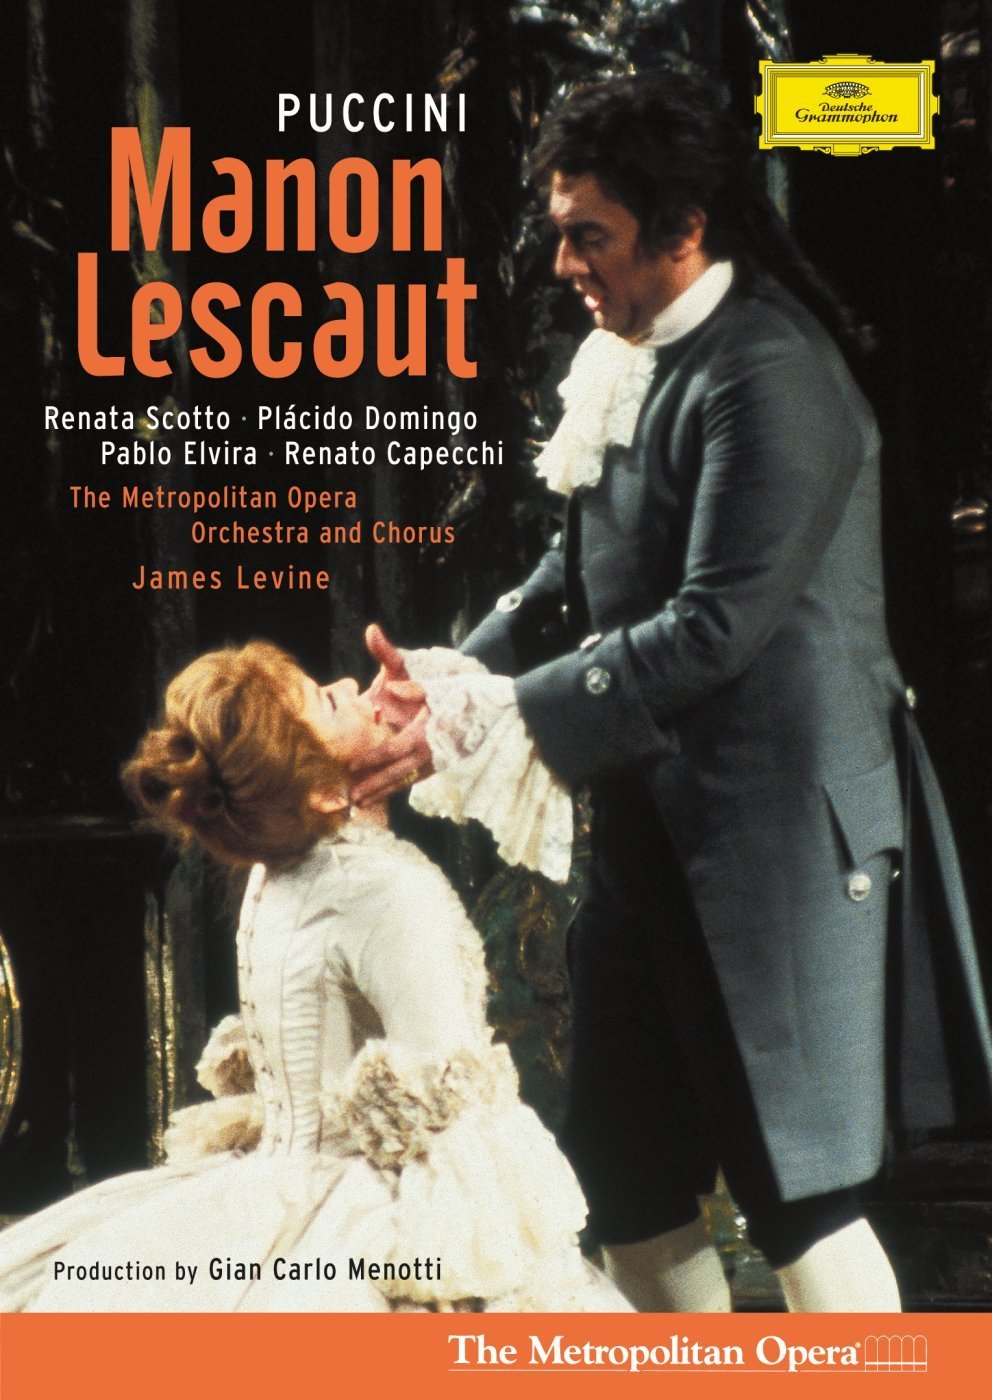 DVD : Metropolitan Opera Orchestra - Manon Lescaut (Subtitled)